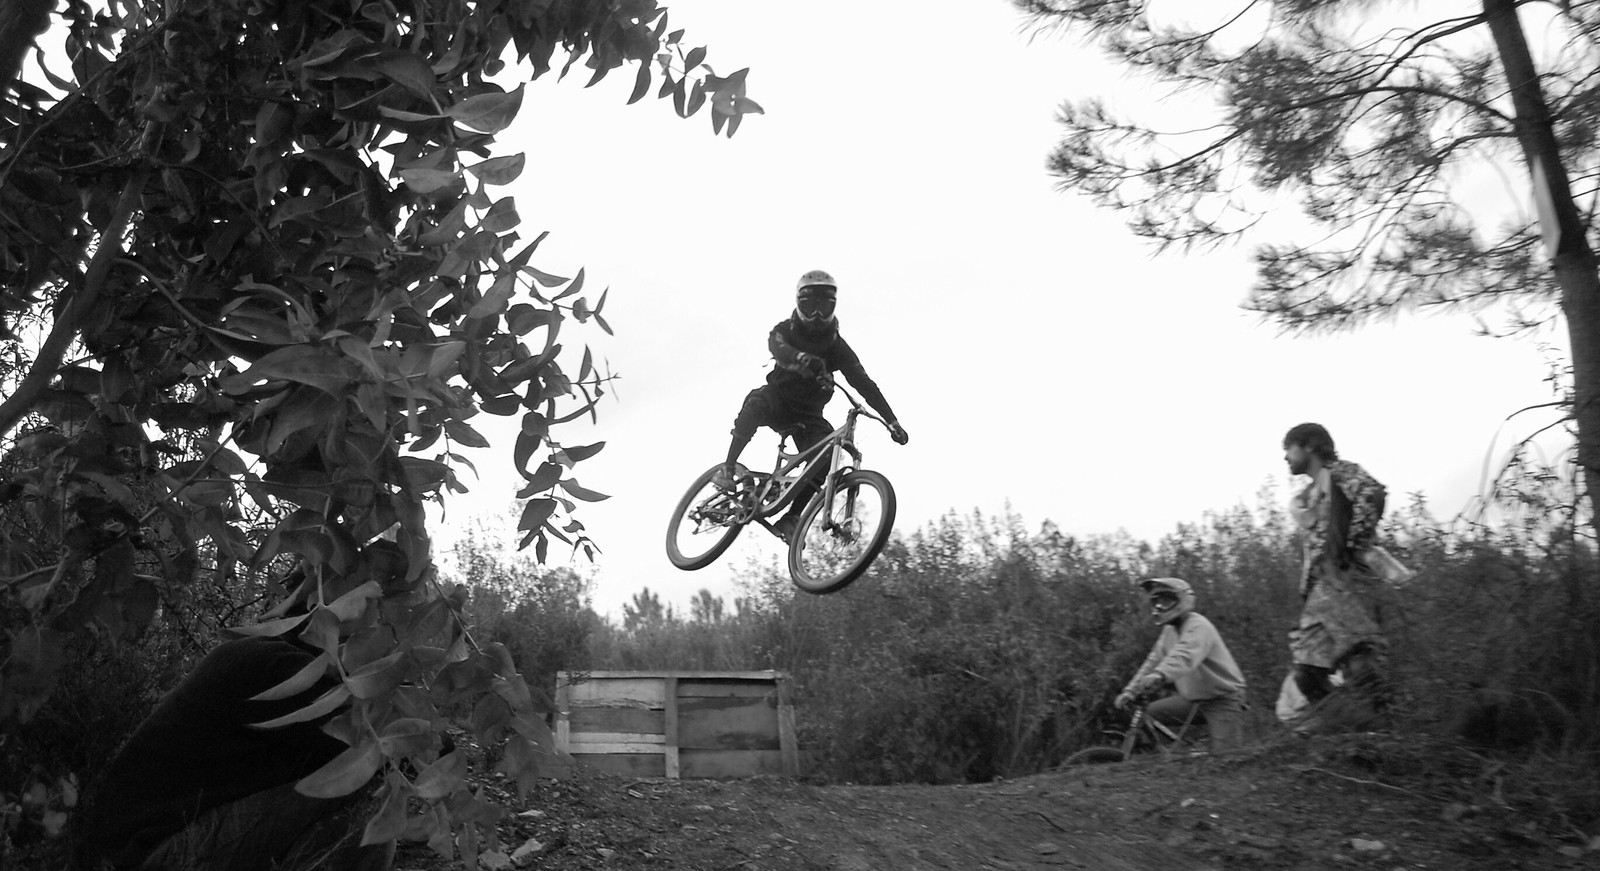 Paul - antonio.mendes.3363 - Mountain Biking Pictures - Vital MTB